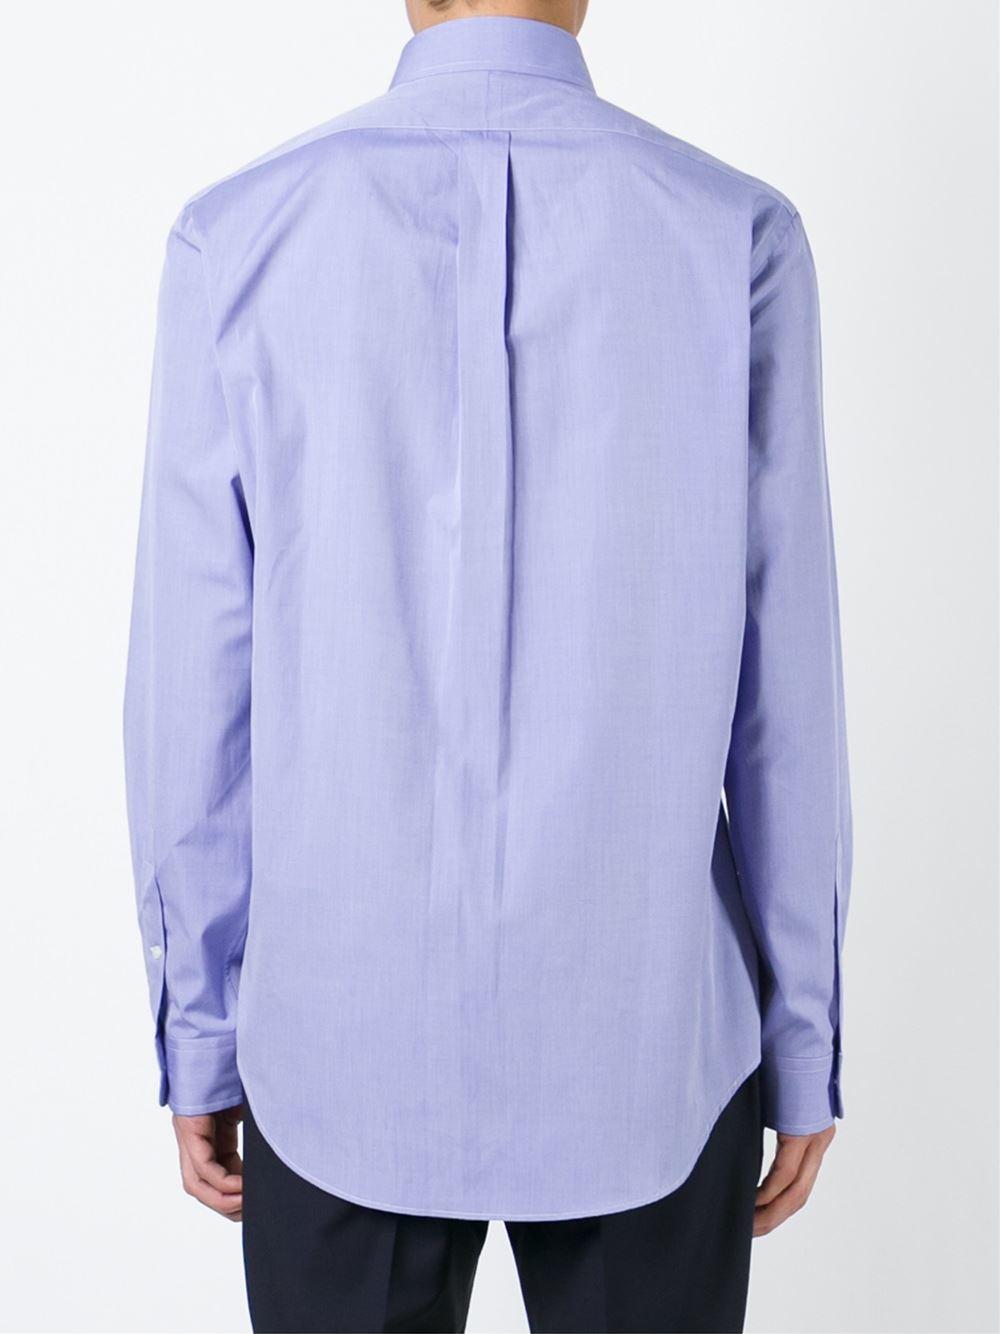 Lyst polo ralph lauren button down collar shirt in blue for Polo ralph lauren casual button down shirts